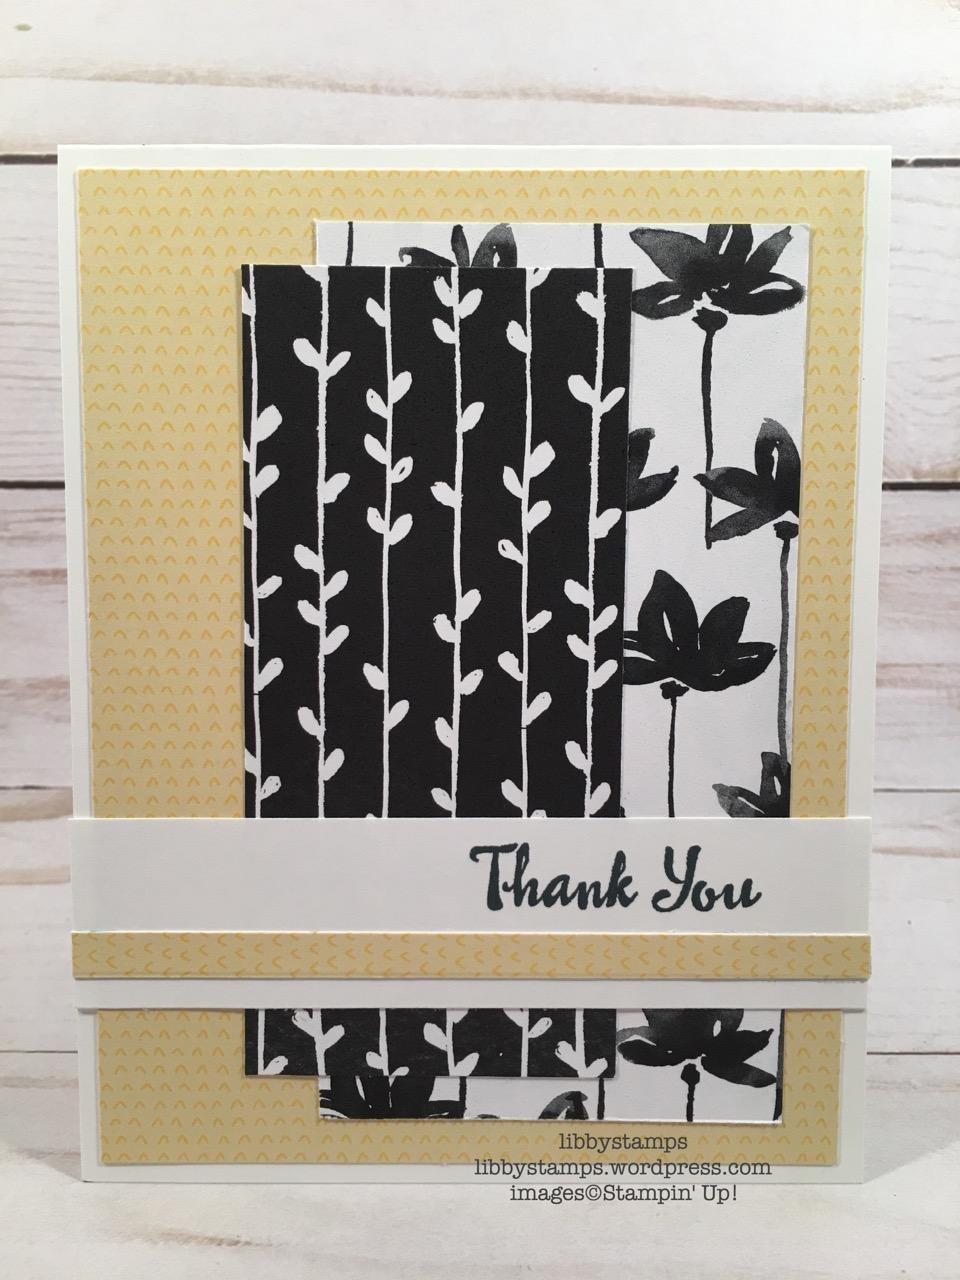 libbystamps, stampin up, Petal Palette, Petal Passion, Tutti-Frutti Cards & Envelopes, CCMC, Sale-a-bration